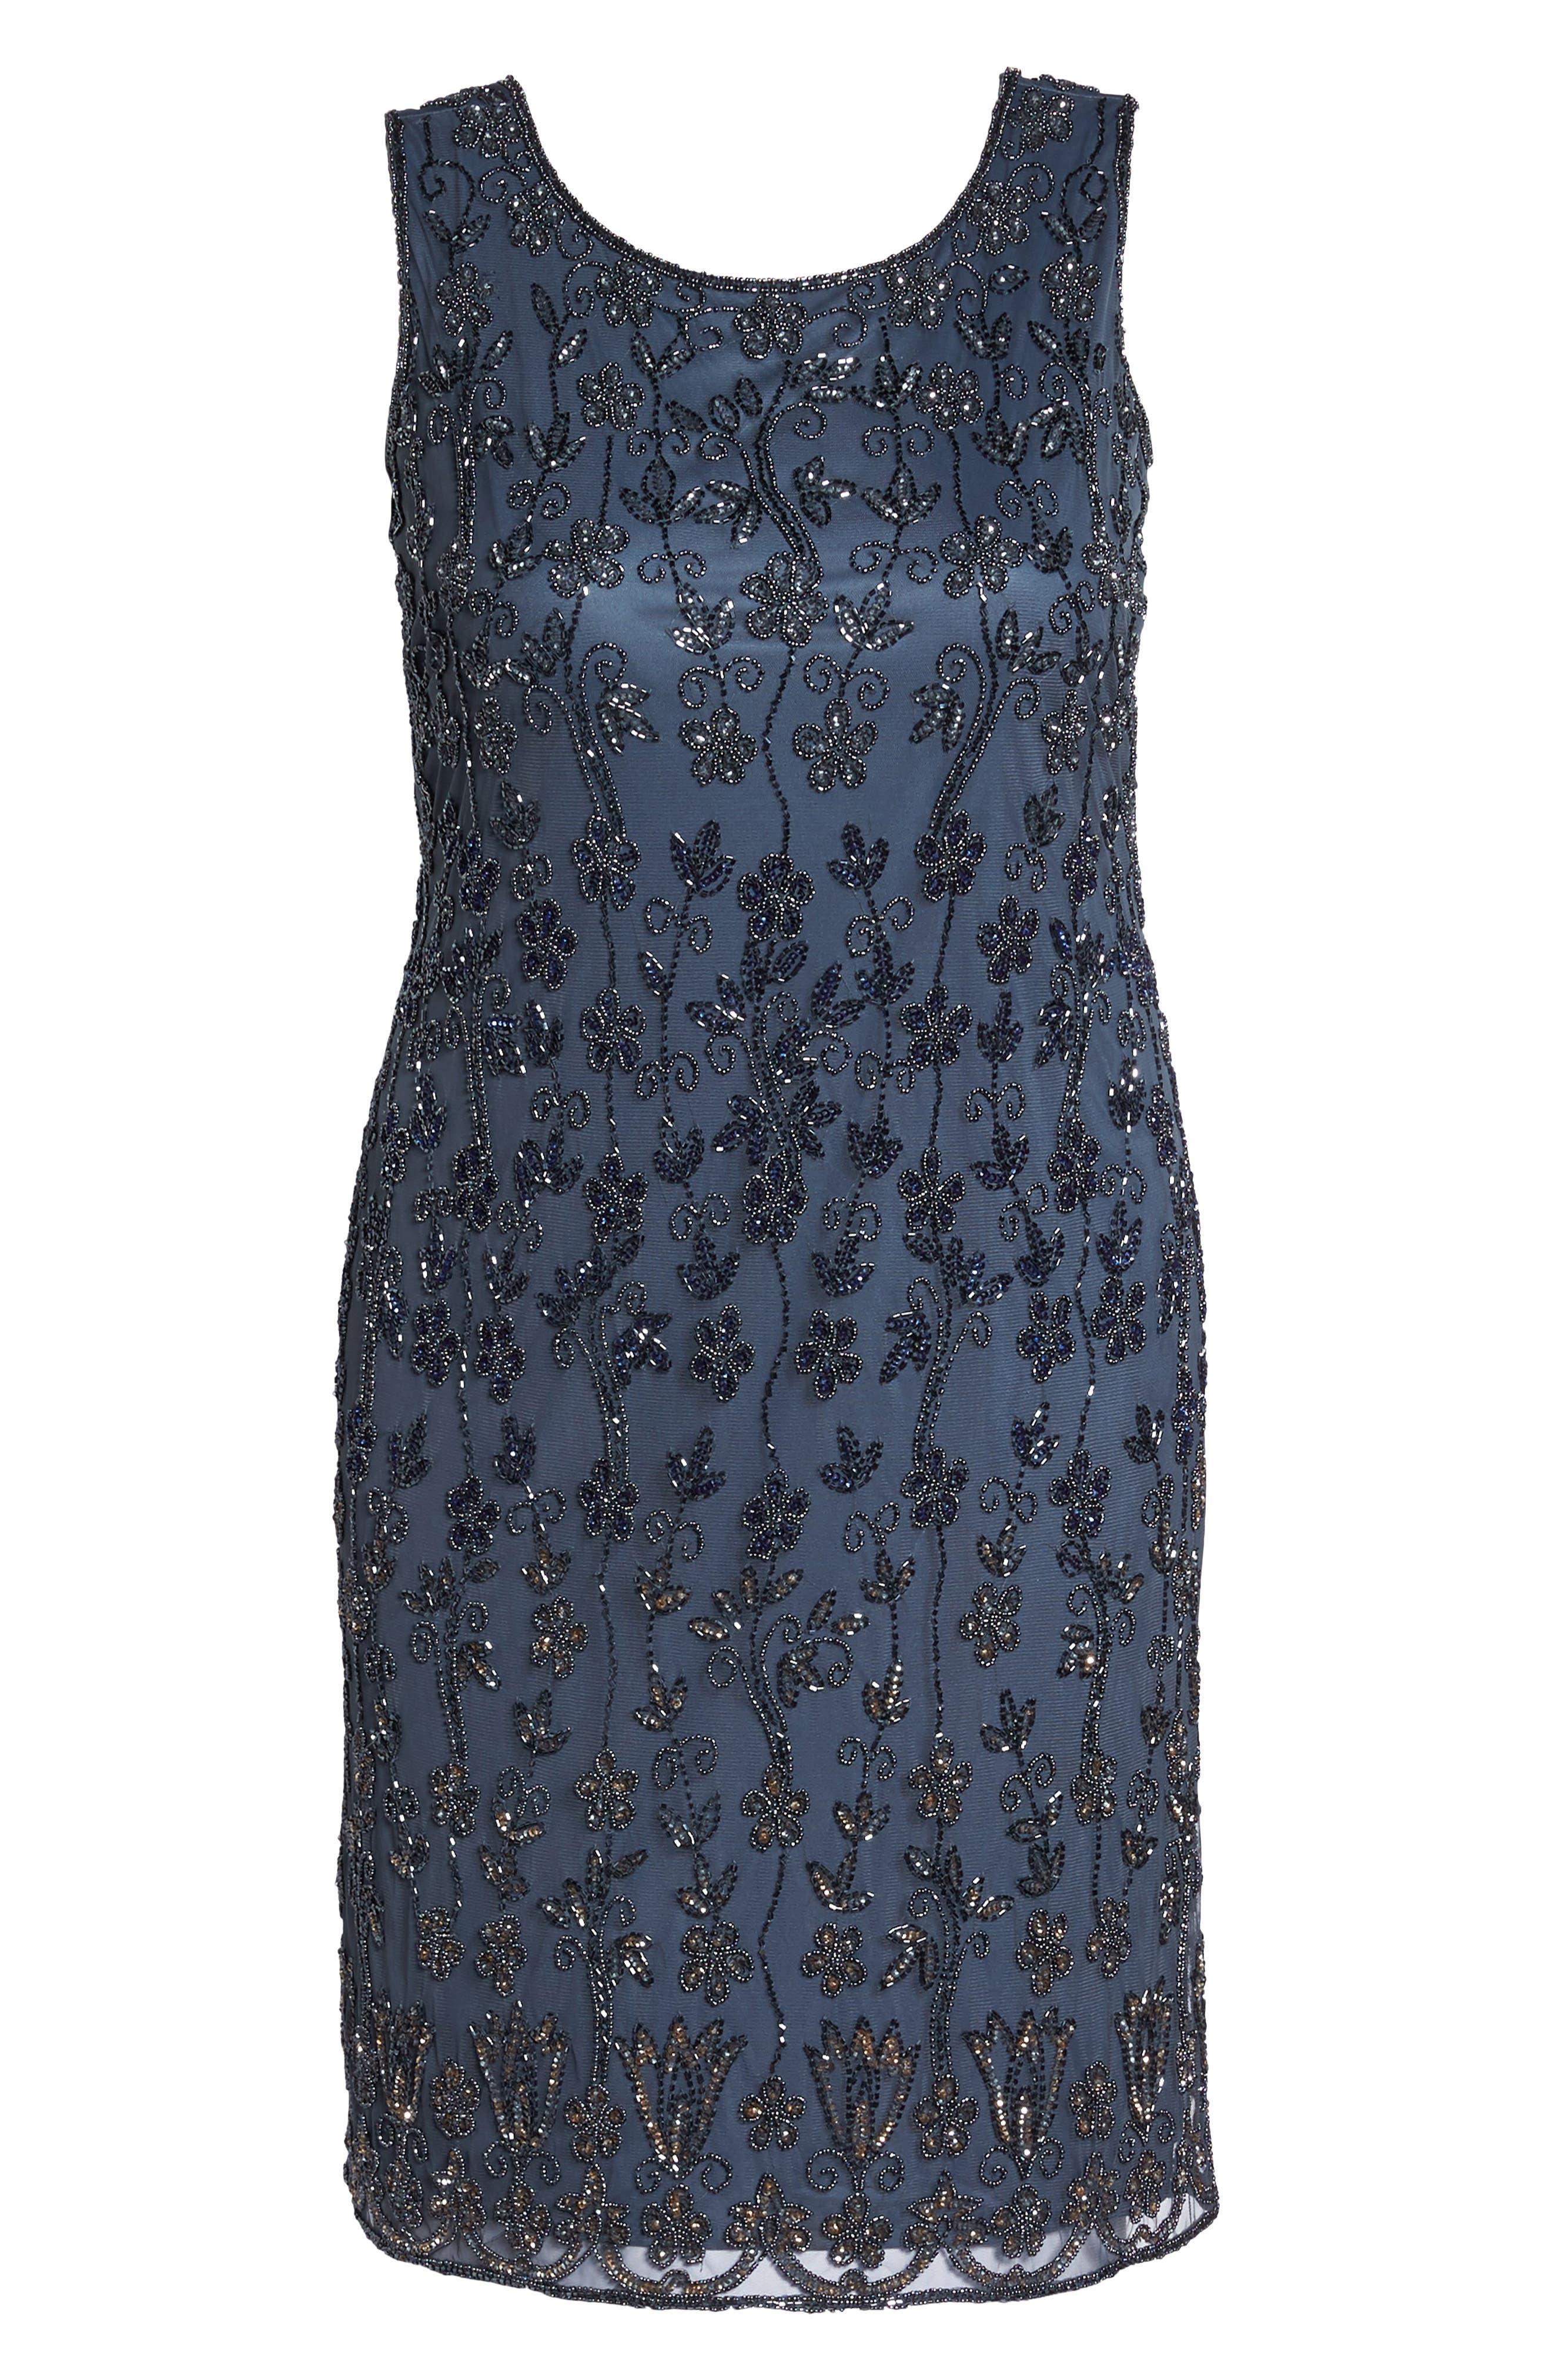 Embellished Mesh Sheath Dress,                             Alternate thumbnail 6, color,                             024